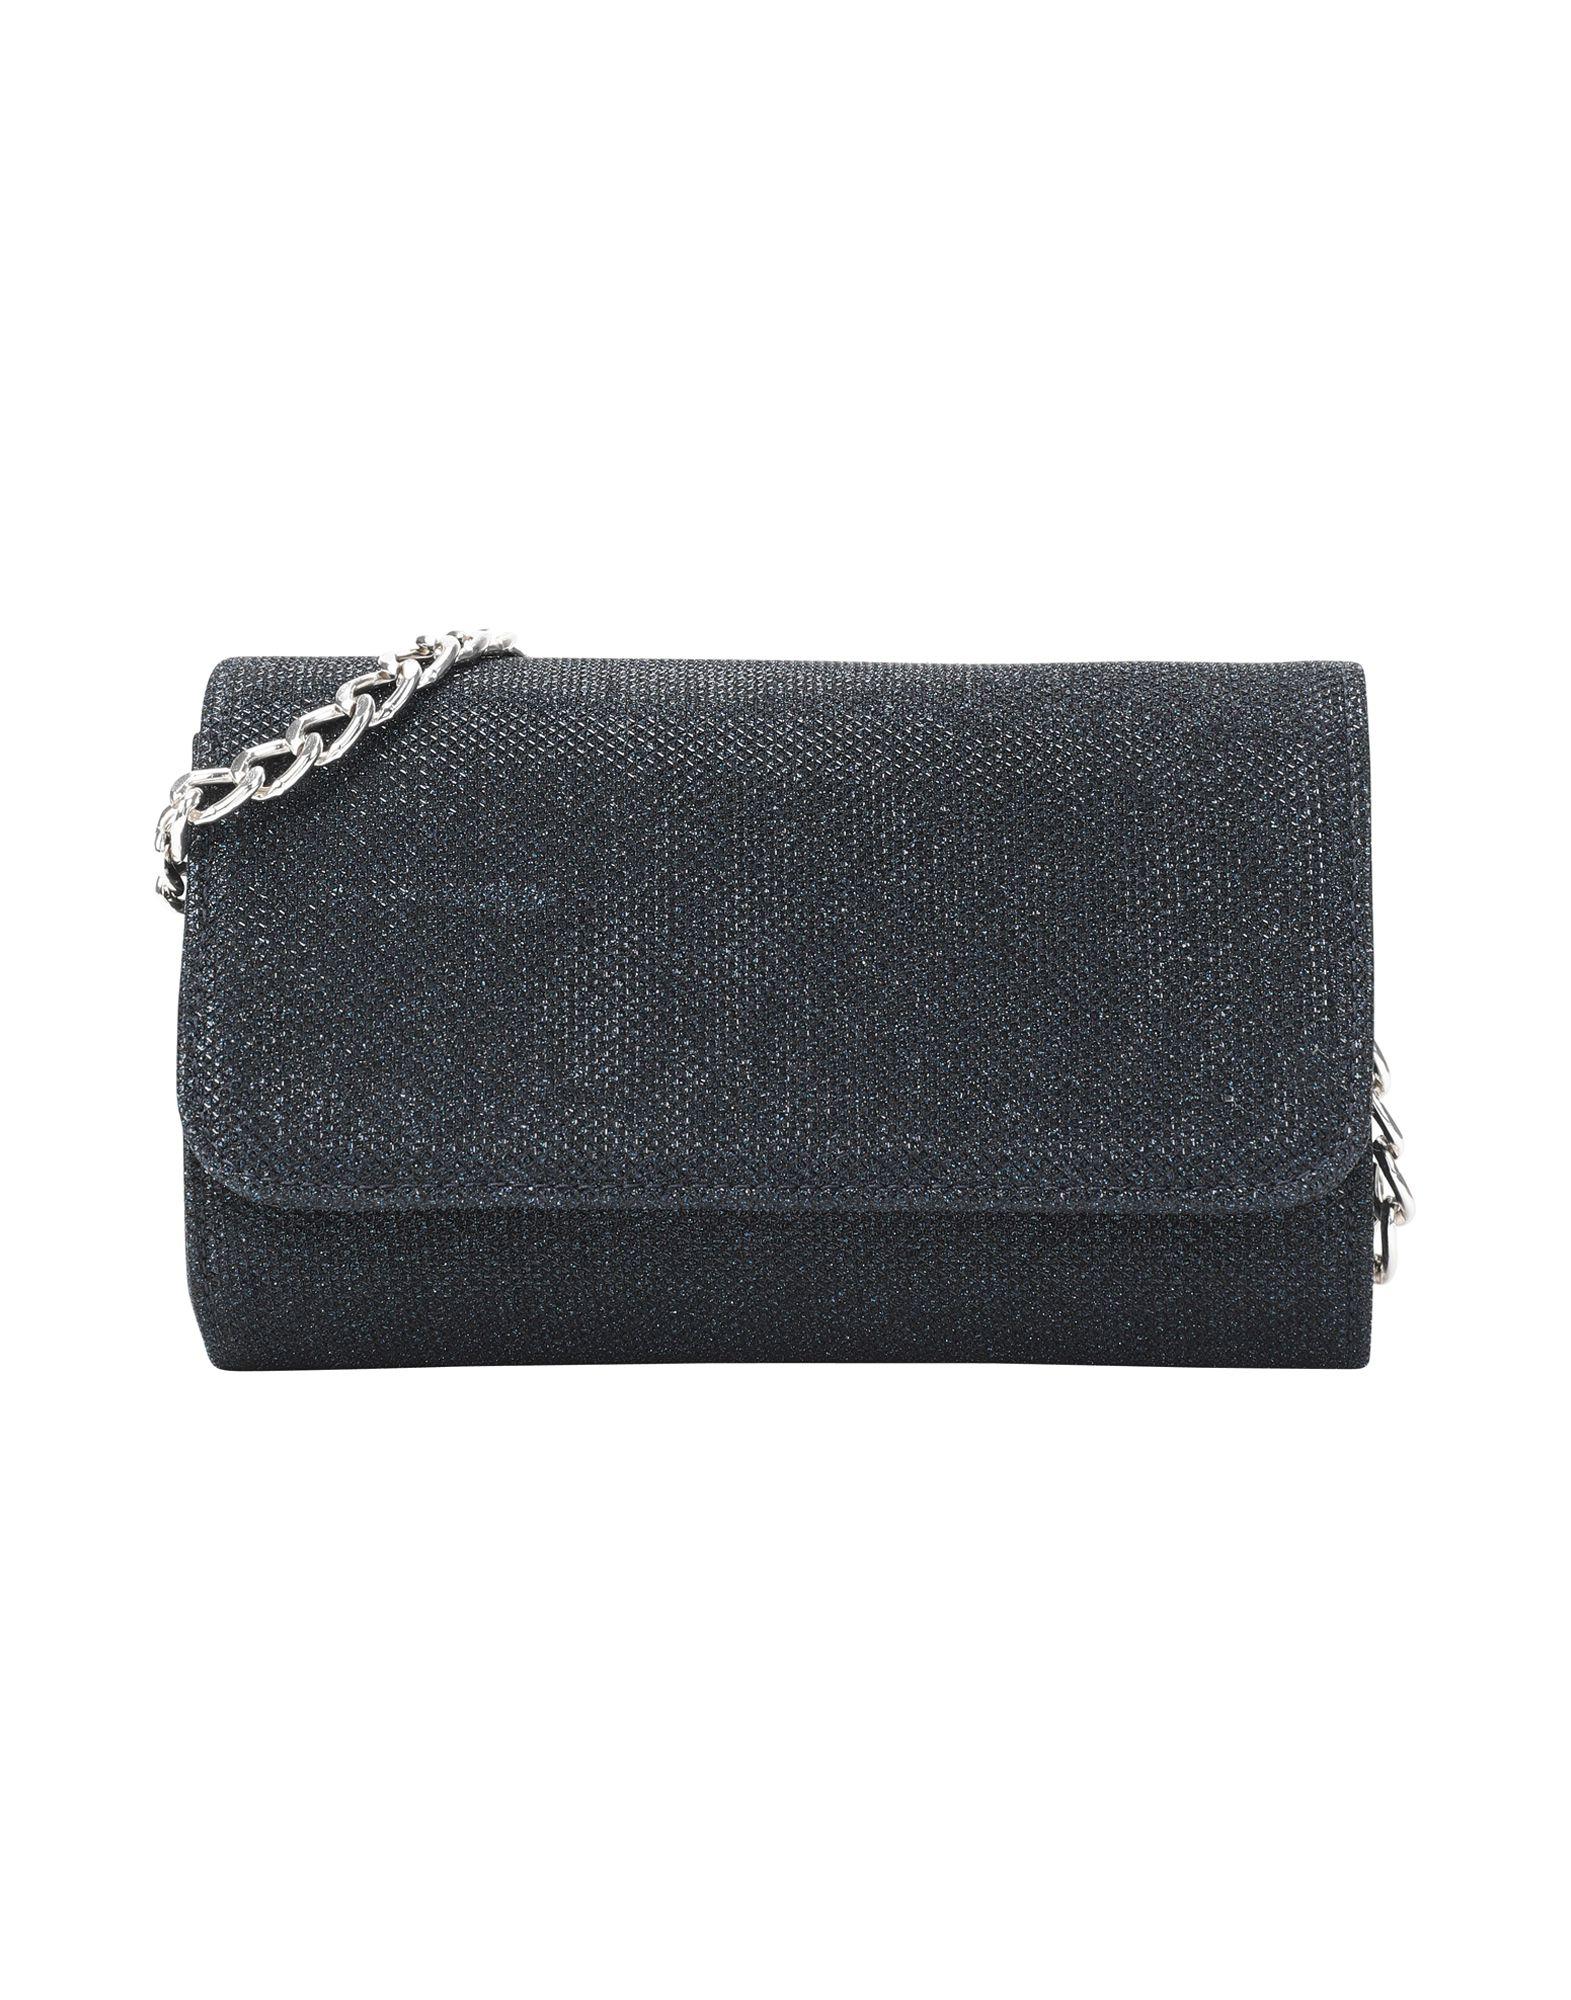 L'ARIANNA Сумка через плечо momo design сумка через плечо